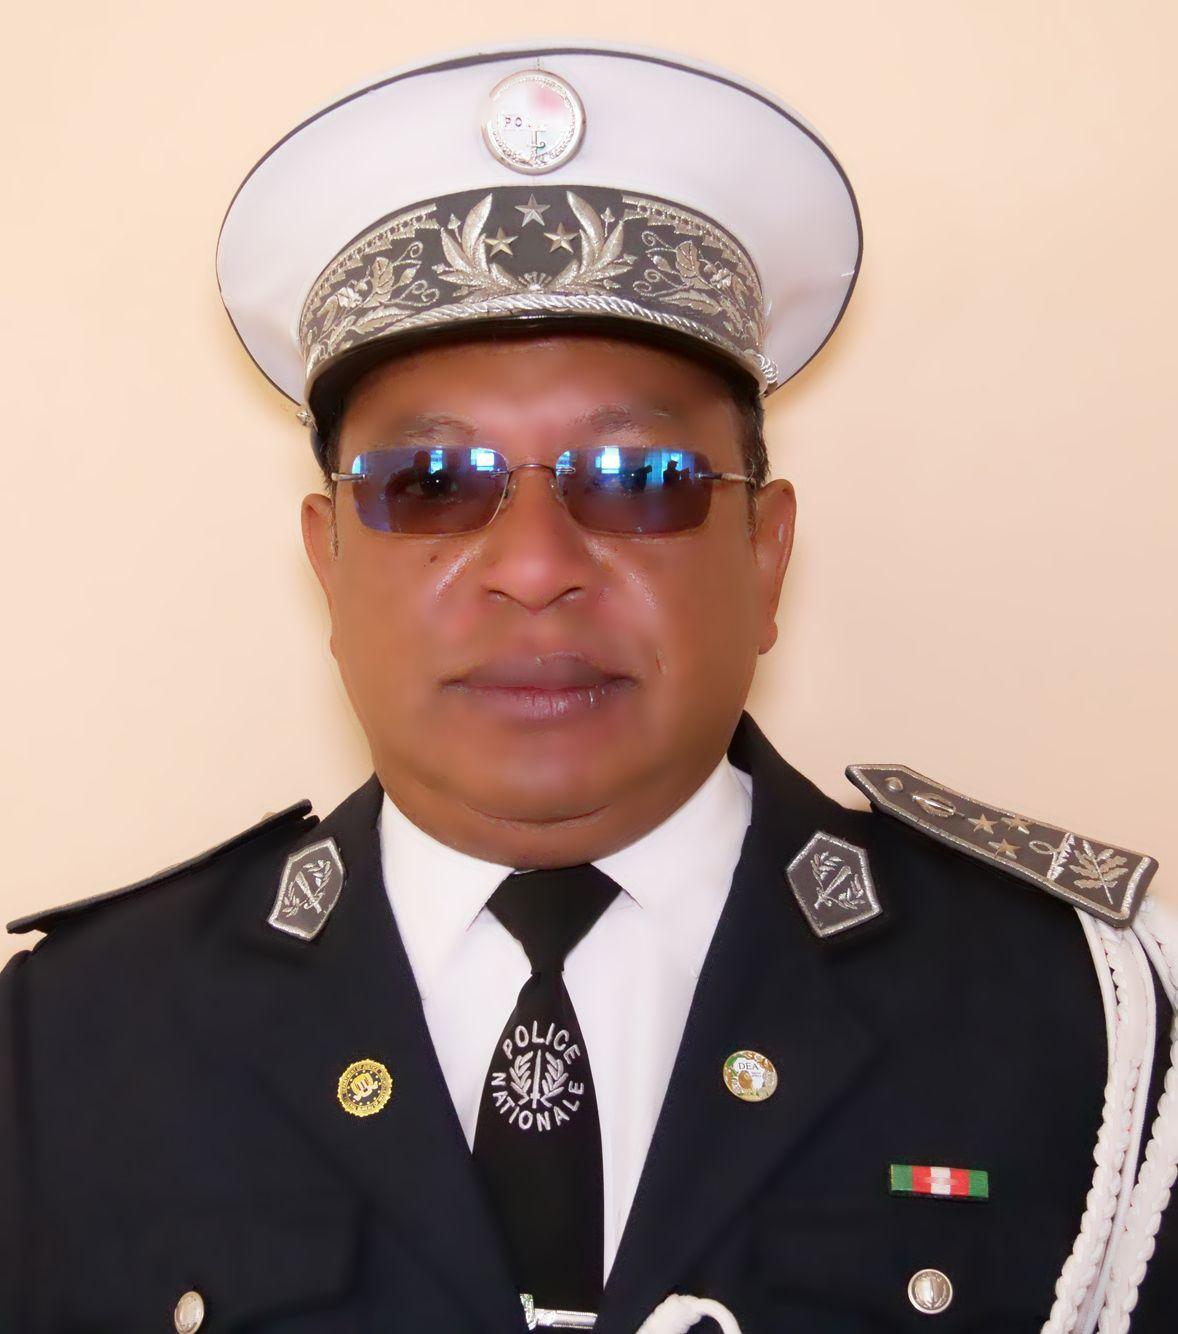 Contrôleur Général de Police, RAJAONARISON José Andrianasolo